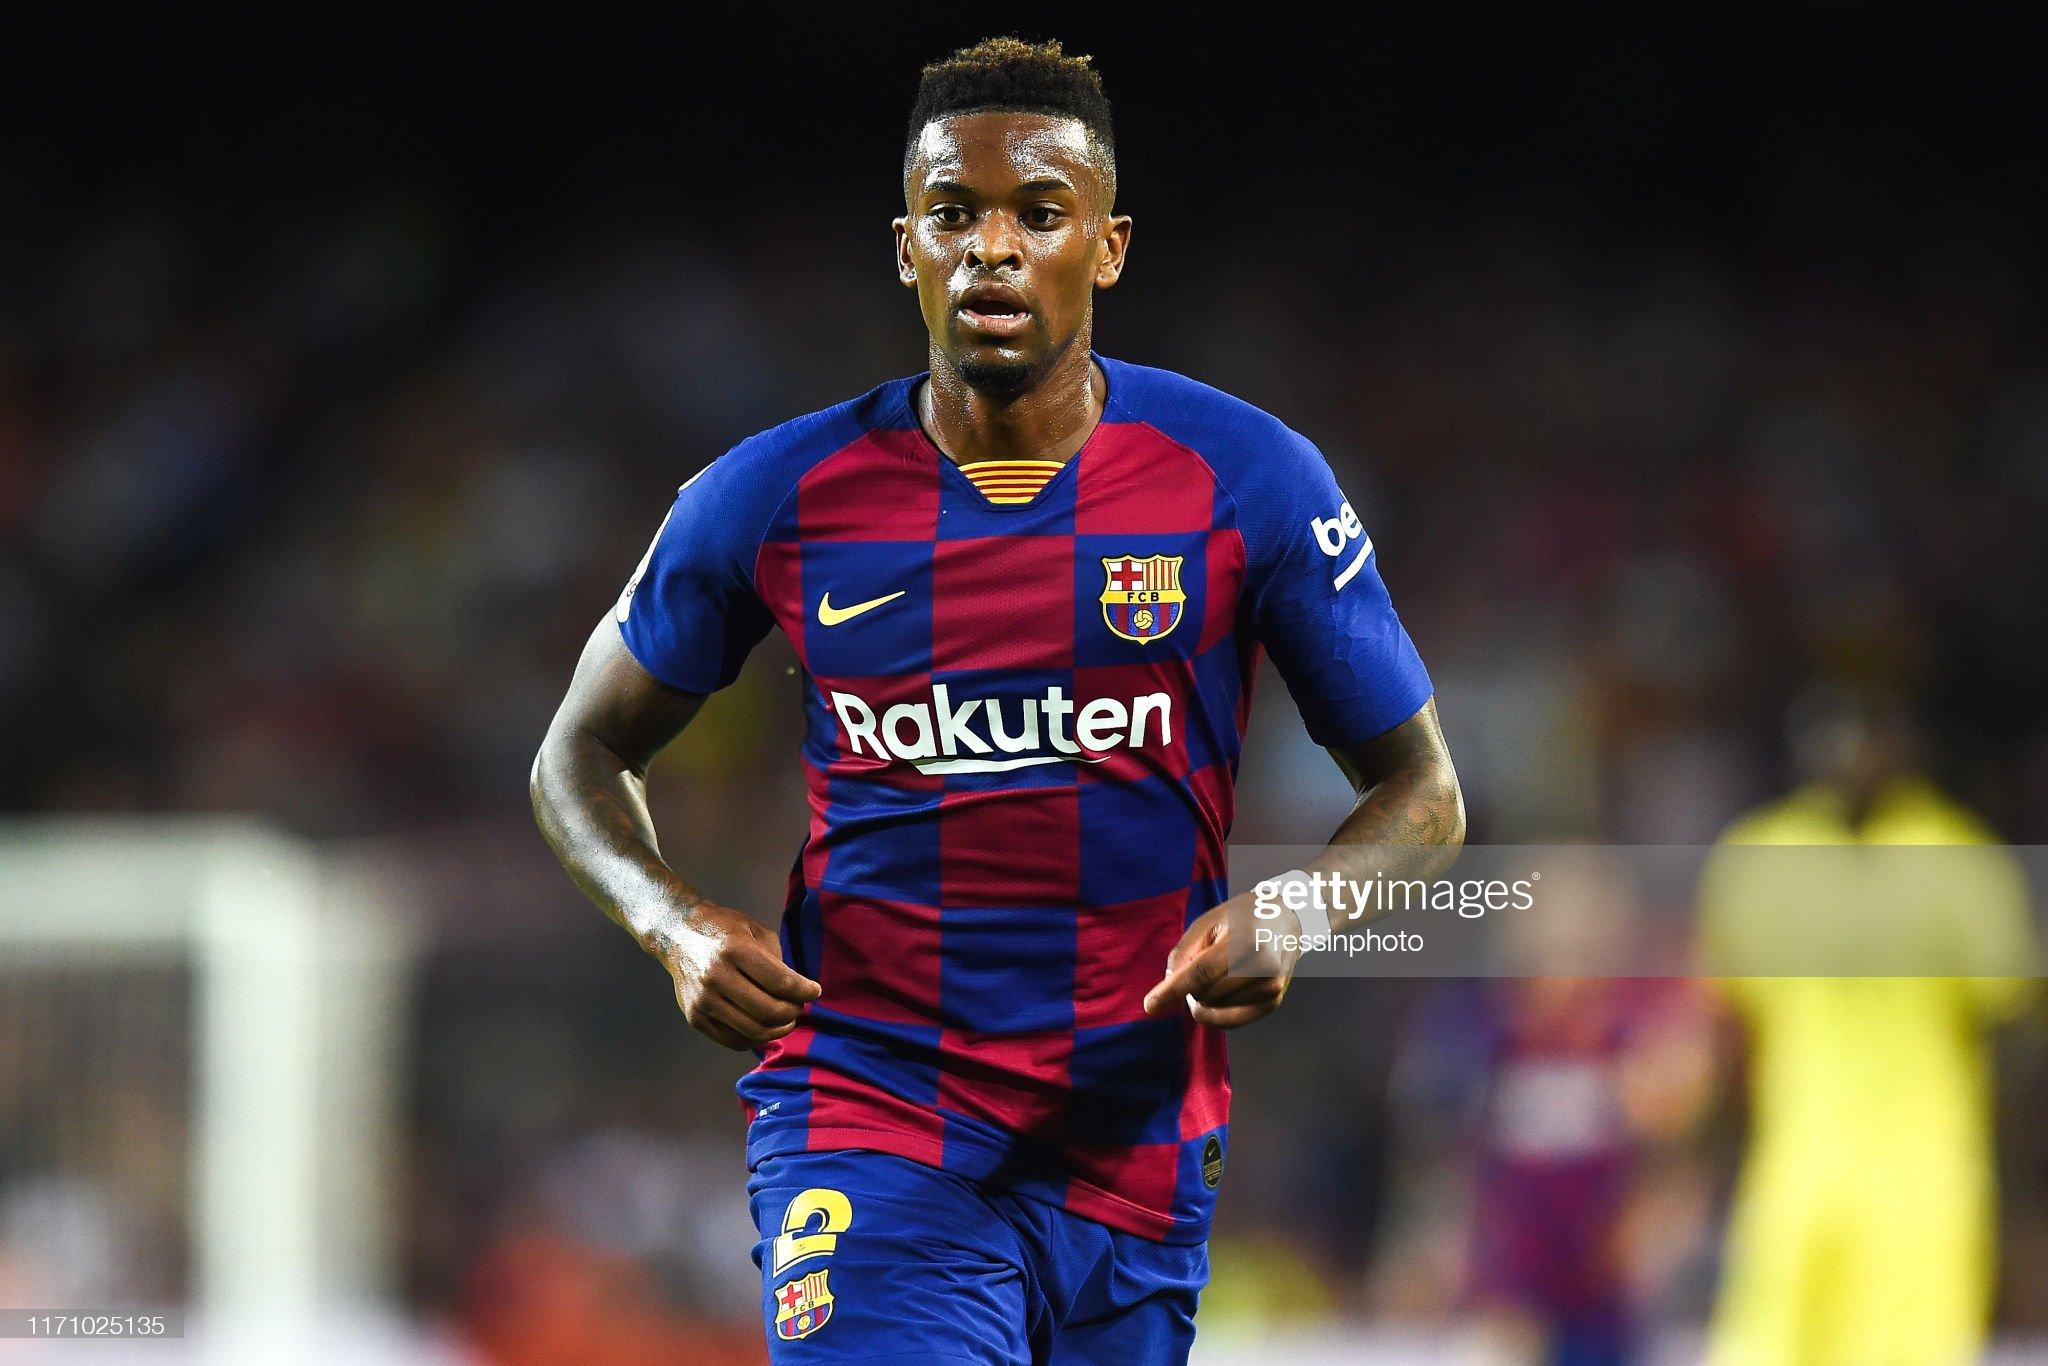 صور مباراة : برشلونة - فياريال 2-1 ( 24-09-2019 )  Nelson-semedo-of-fc-barcelona-during-the-liga-match-between-barcelona-picture-id1171025135?s=2048x2048